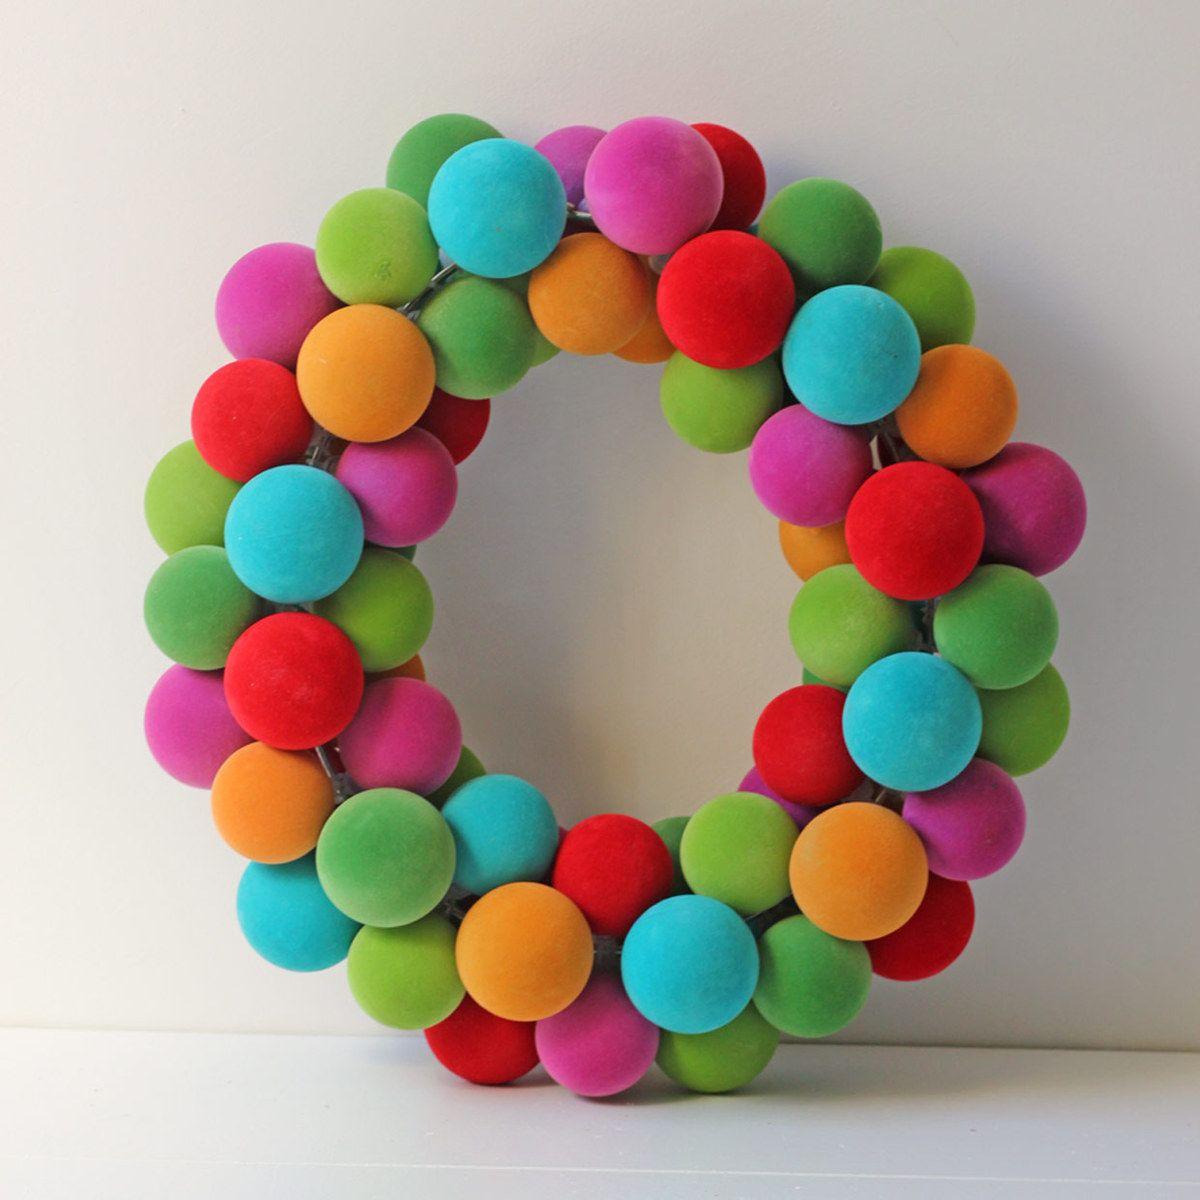 Love this Felt Ball Wreath - would make a great DIY project. #holidays #diy #christmas #wreath ...